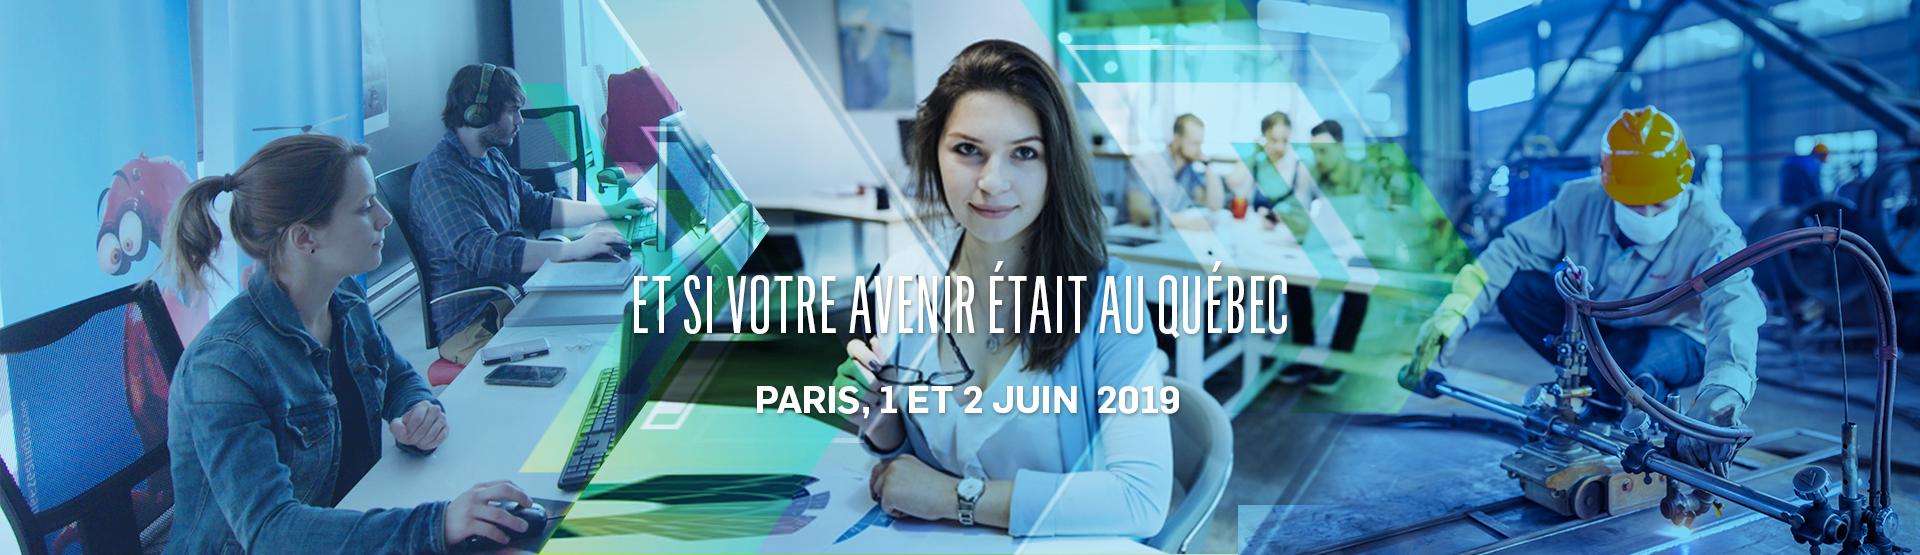 Journees Quebec 2019